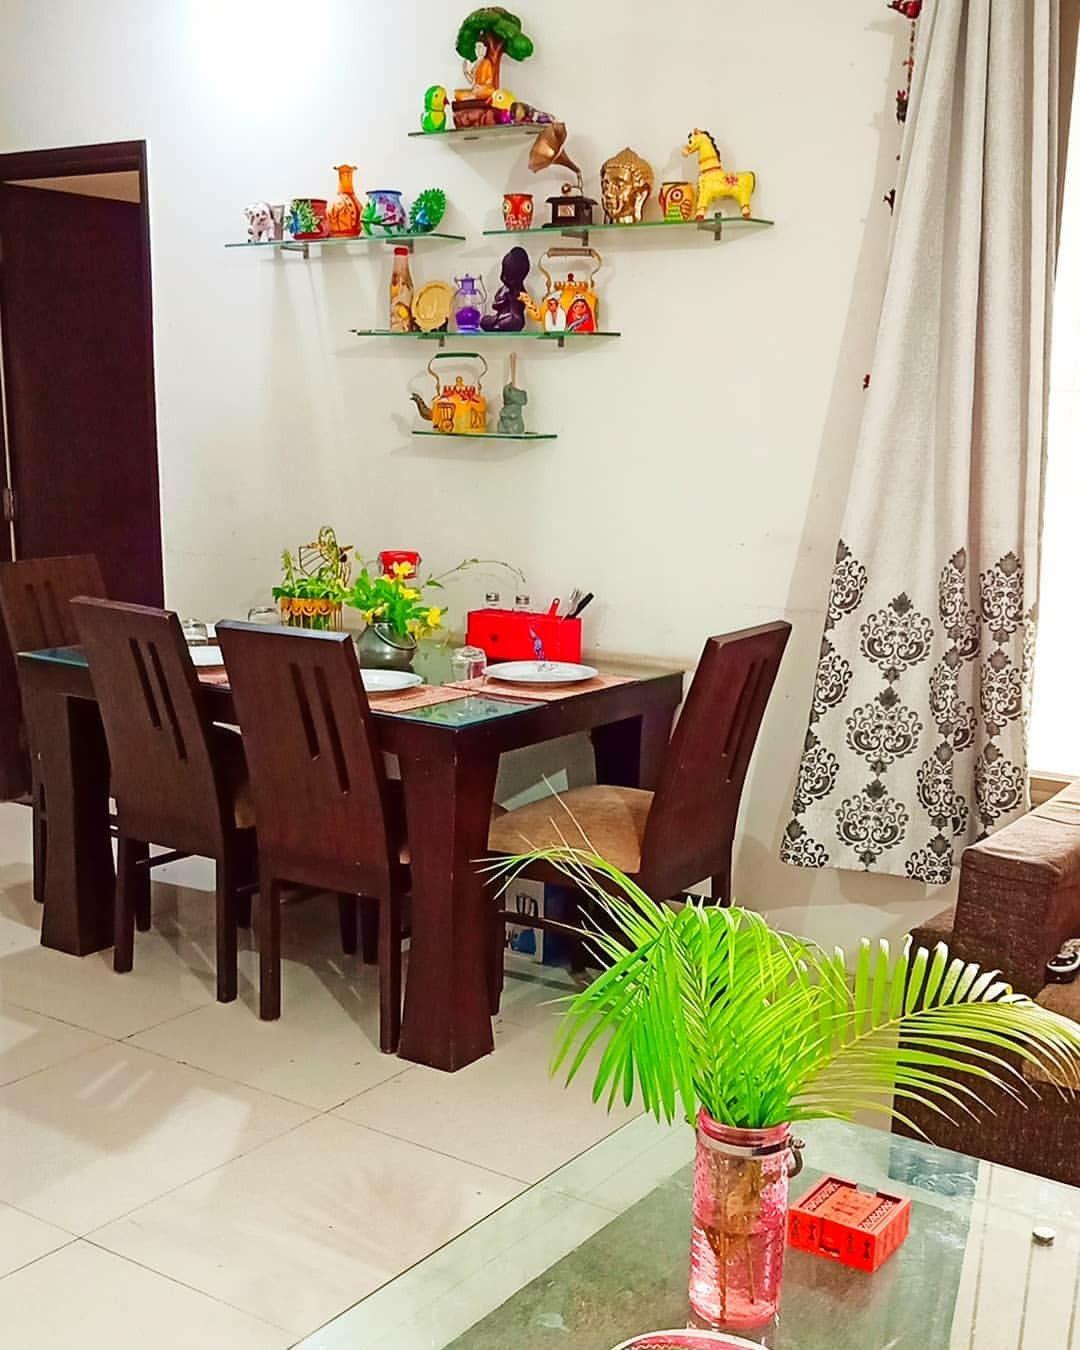 Pin By Swetha Surendranath On Sai Nilayam Colourful Living Room Decor Dining Wall Decor Indian Room Decor